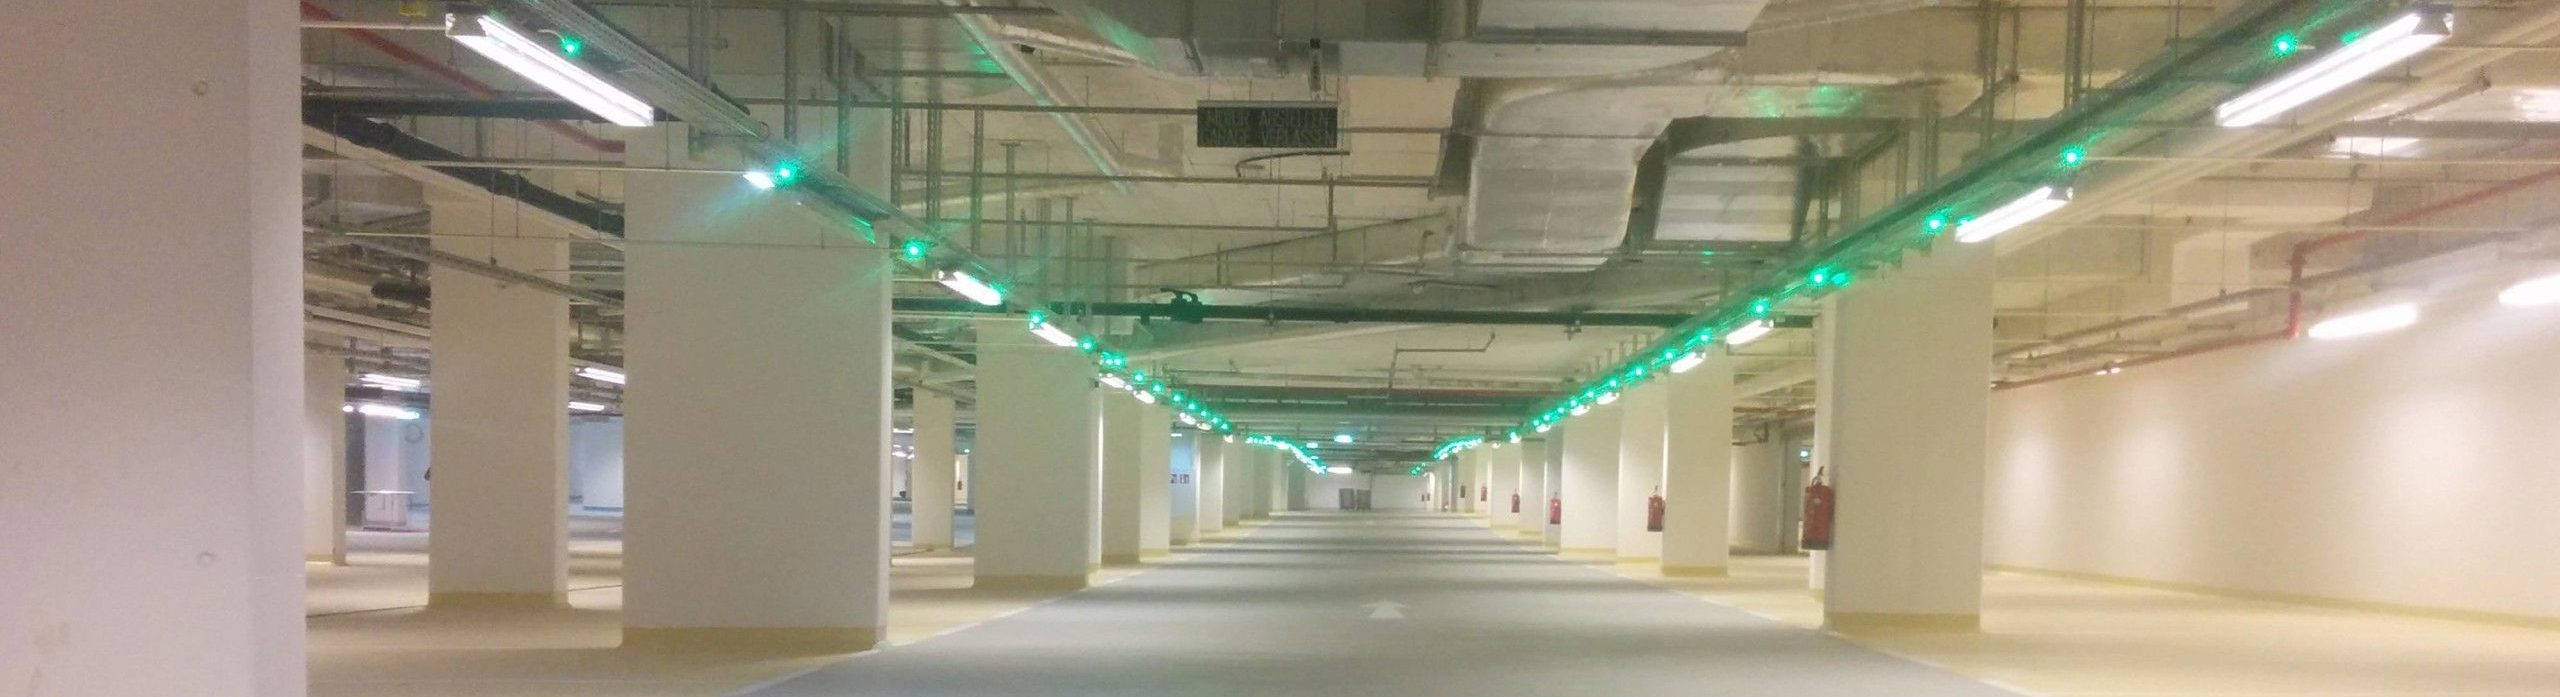 parkleitsystem